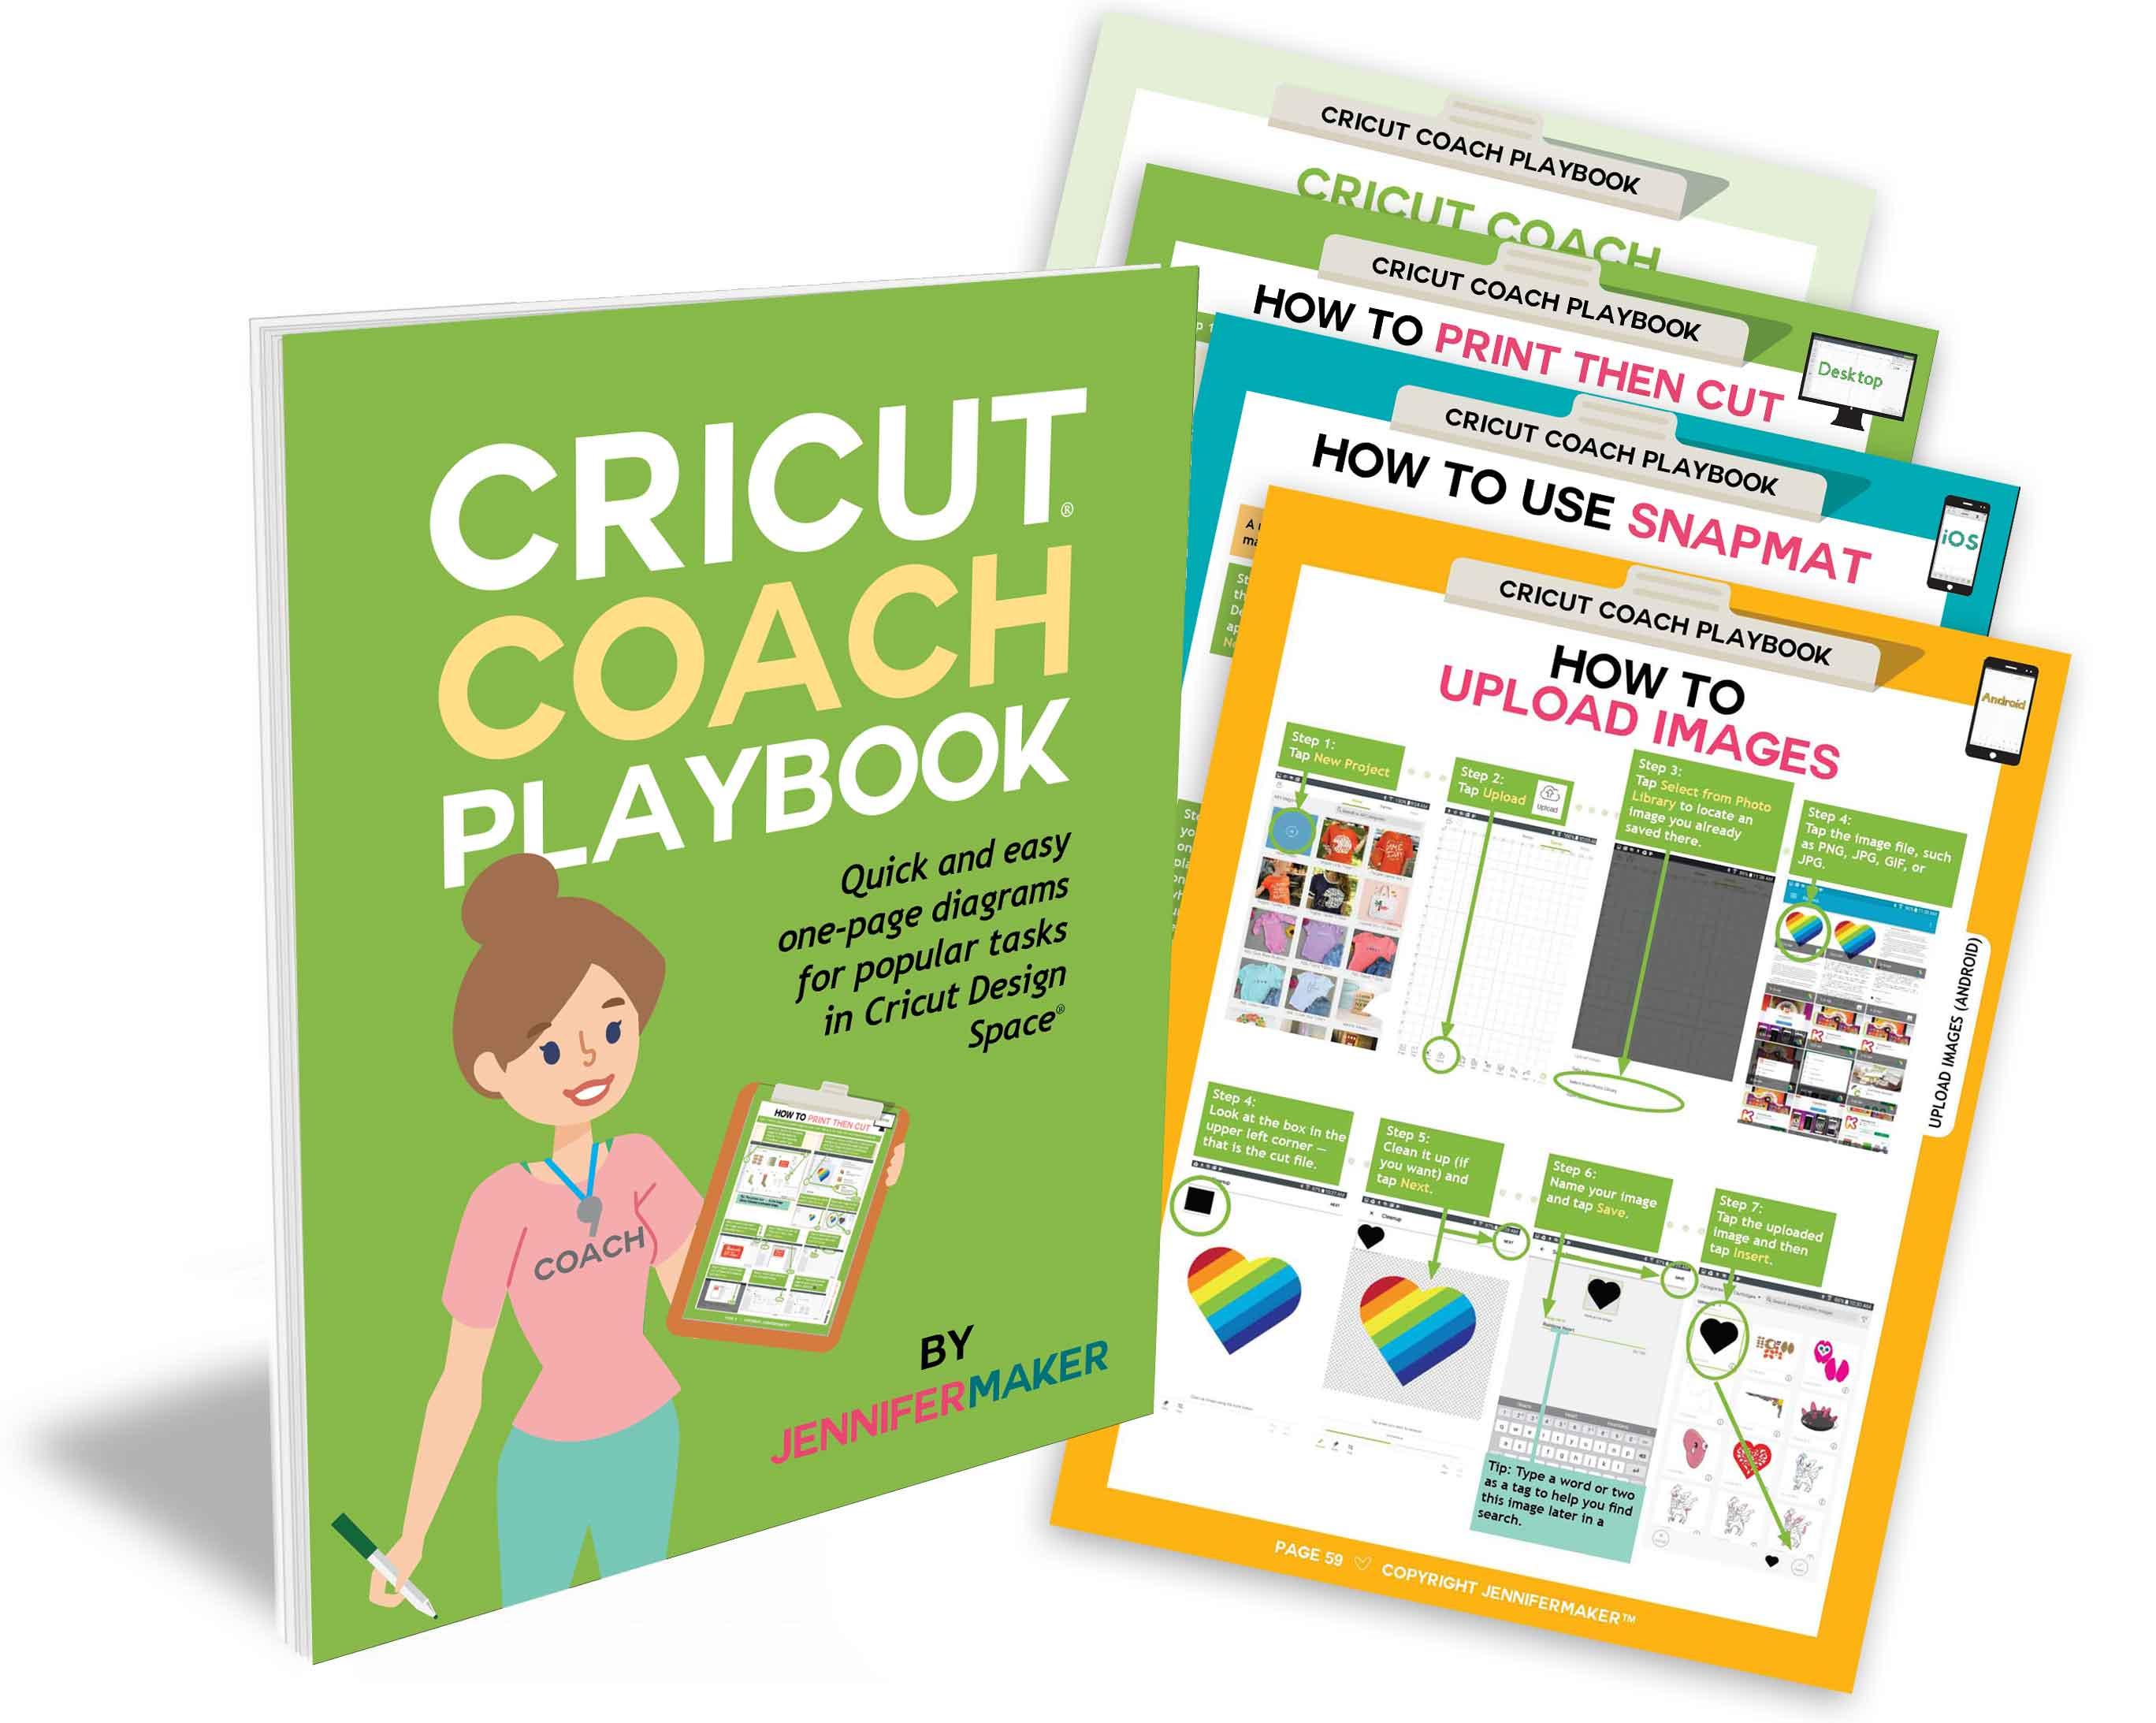 Cricut Coach Playbook